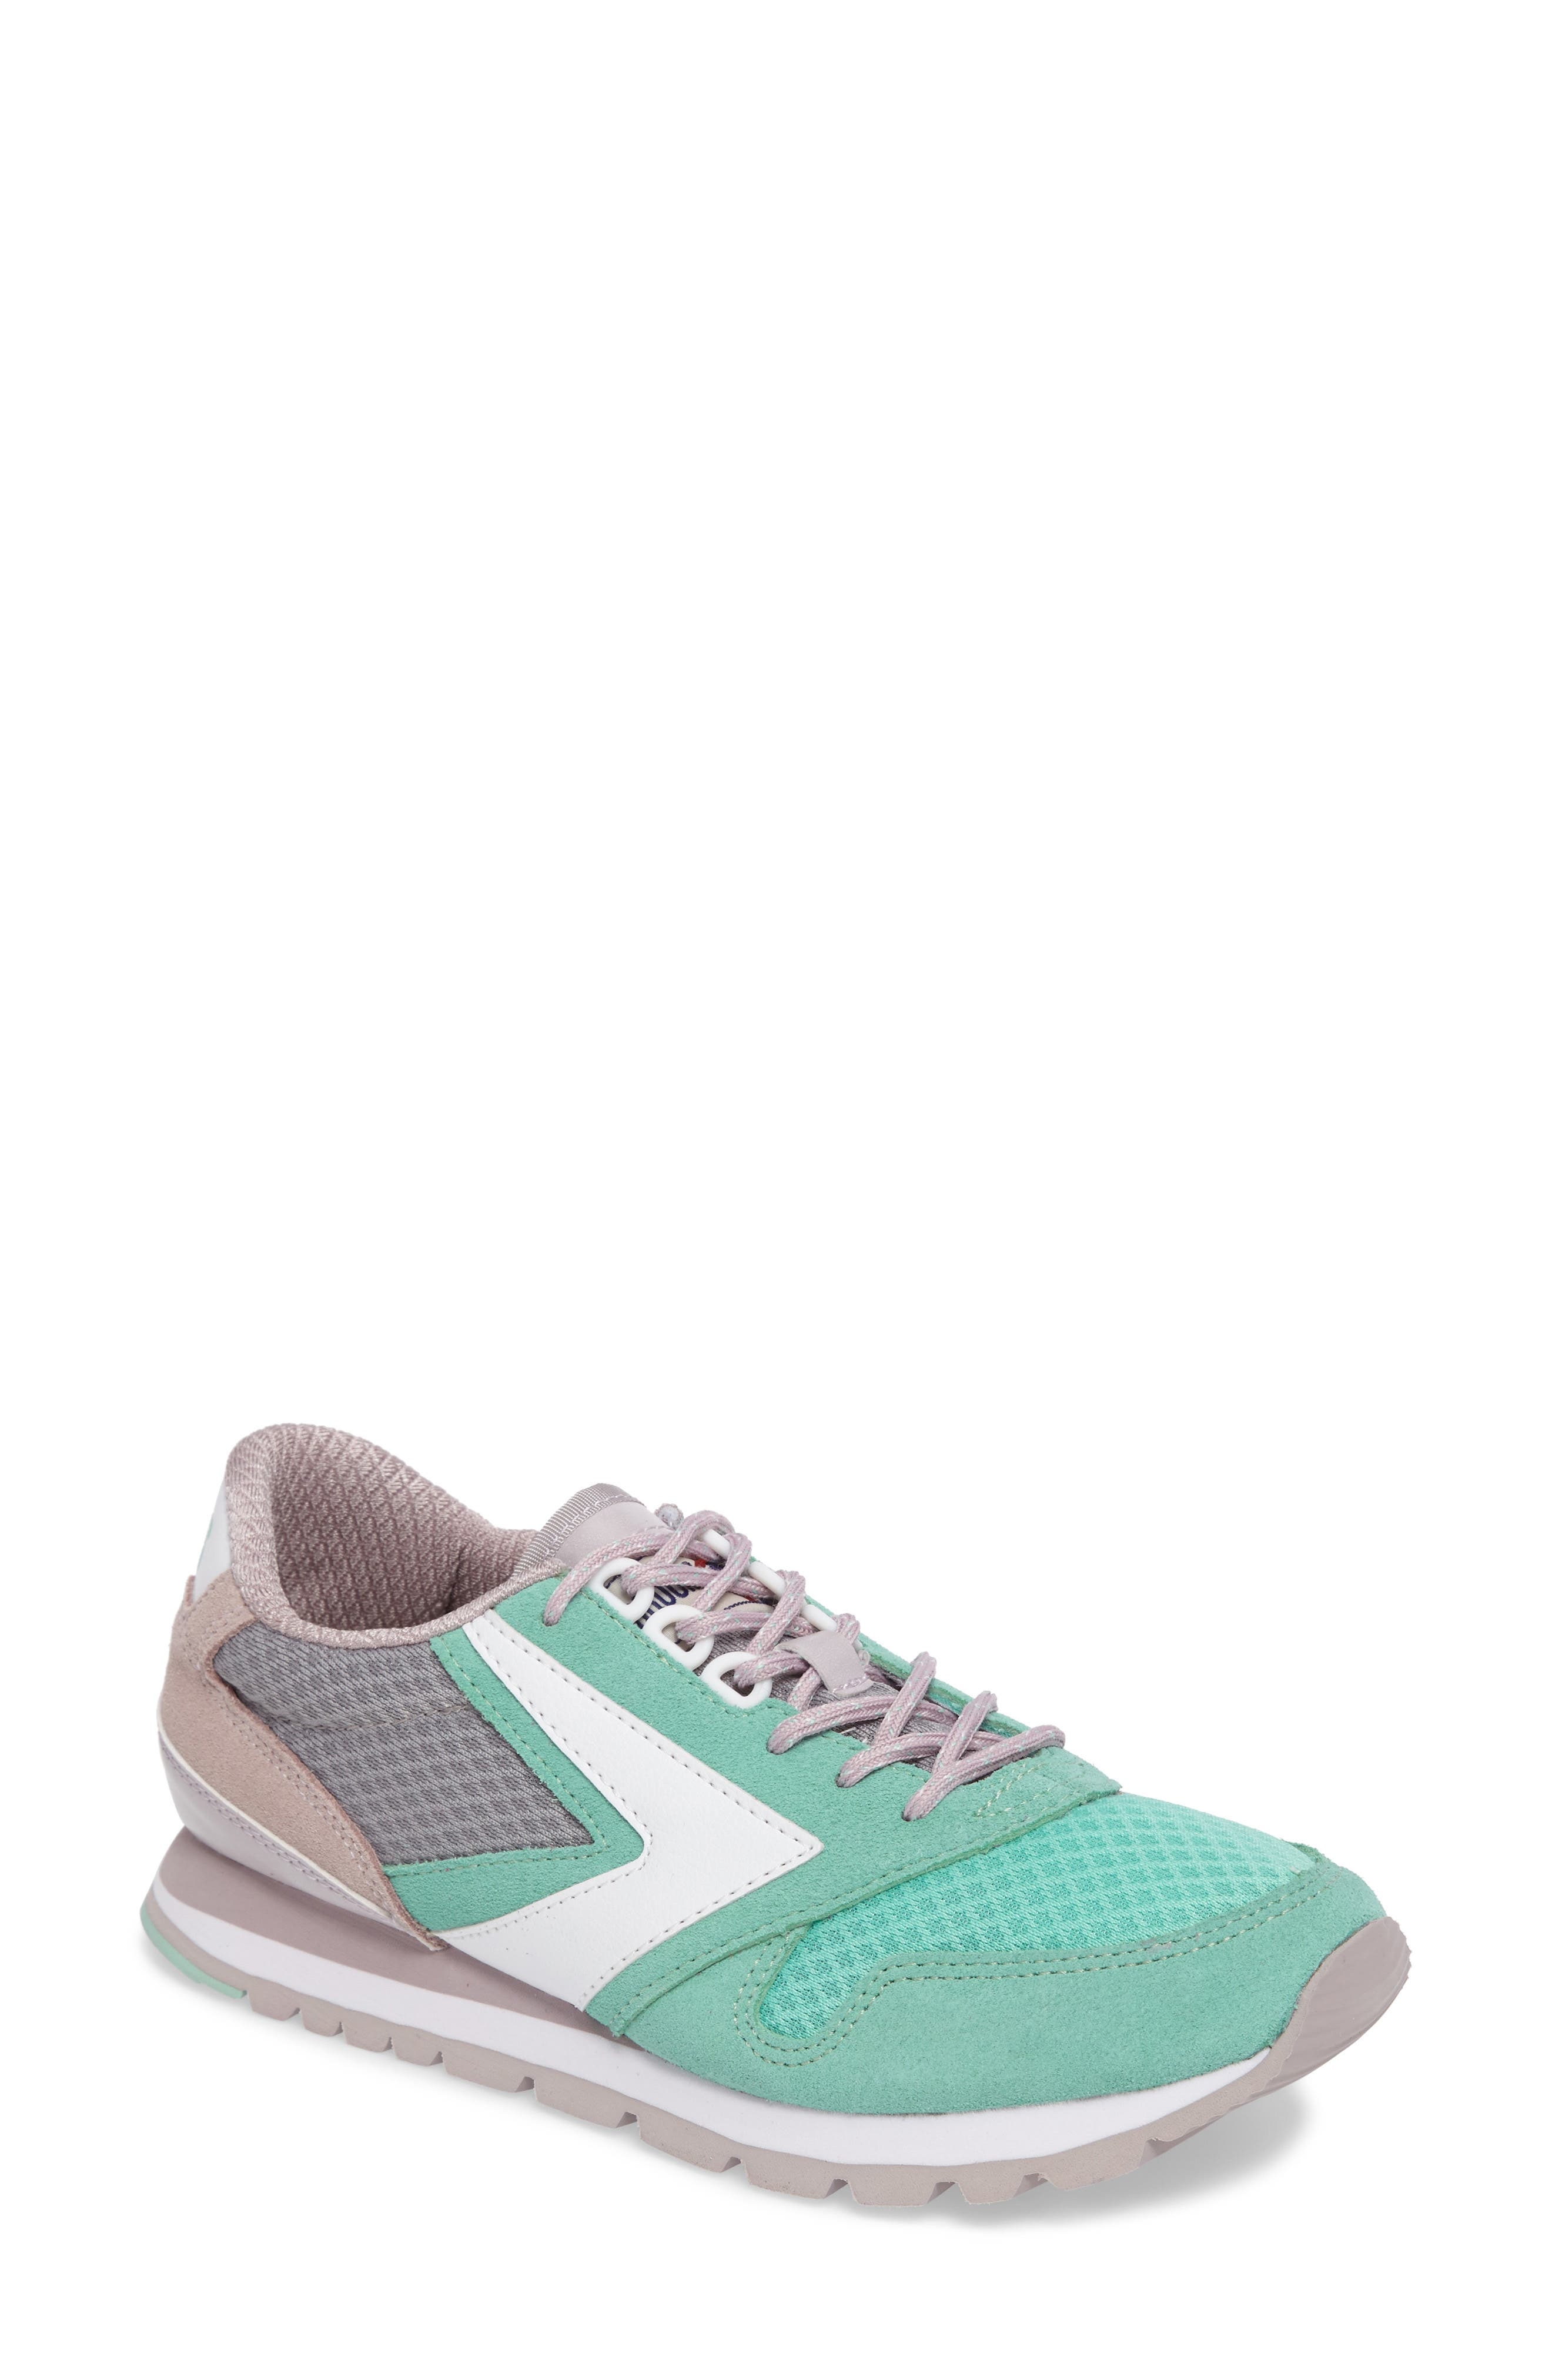 'Chariot' Sneaker,                             Main thumbnail 1, color,                             Cloud Grey/ Cabbage